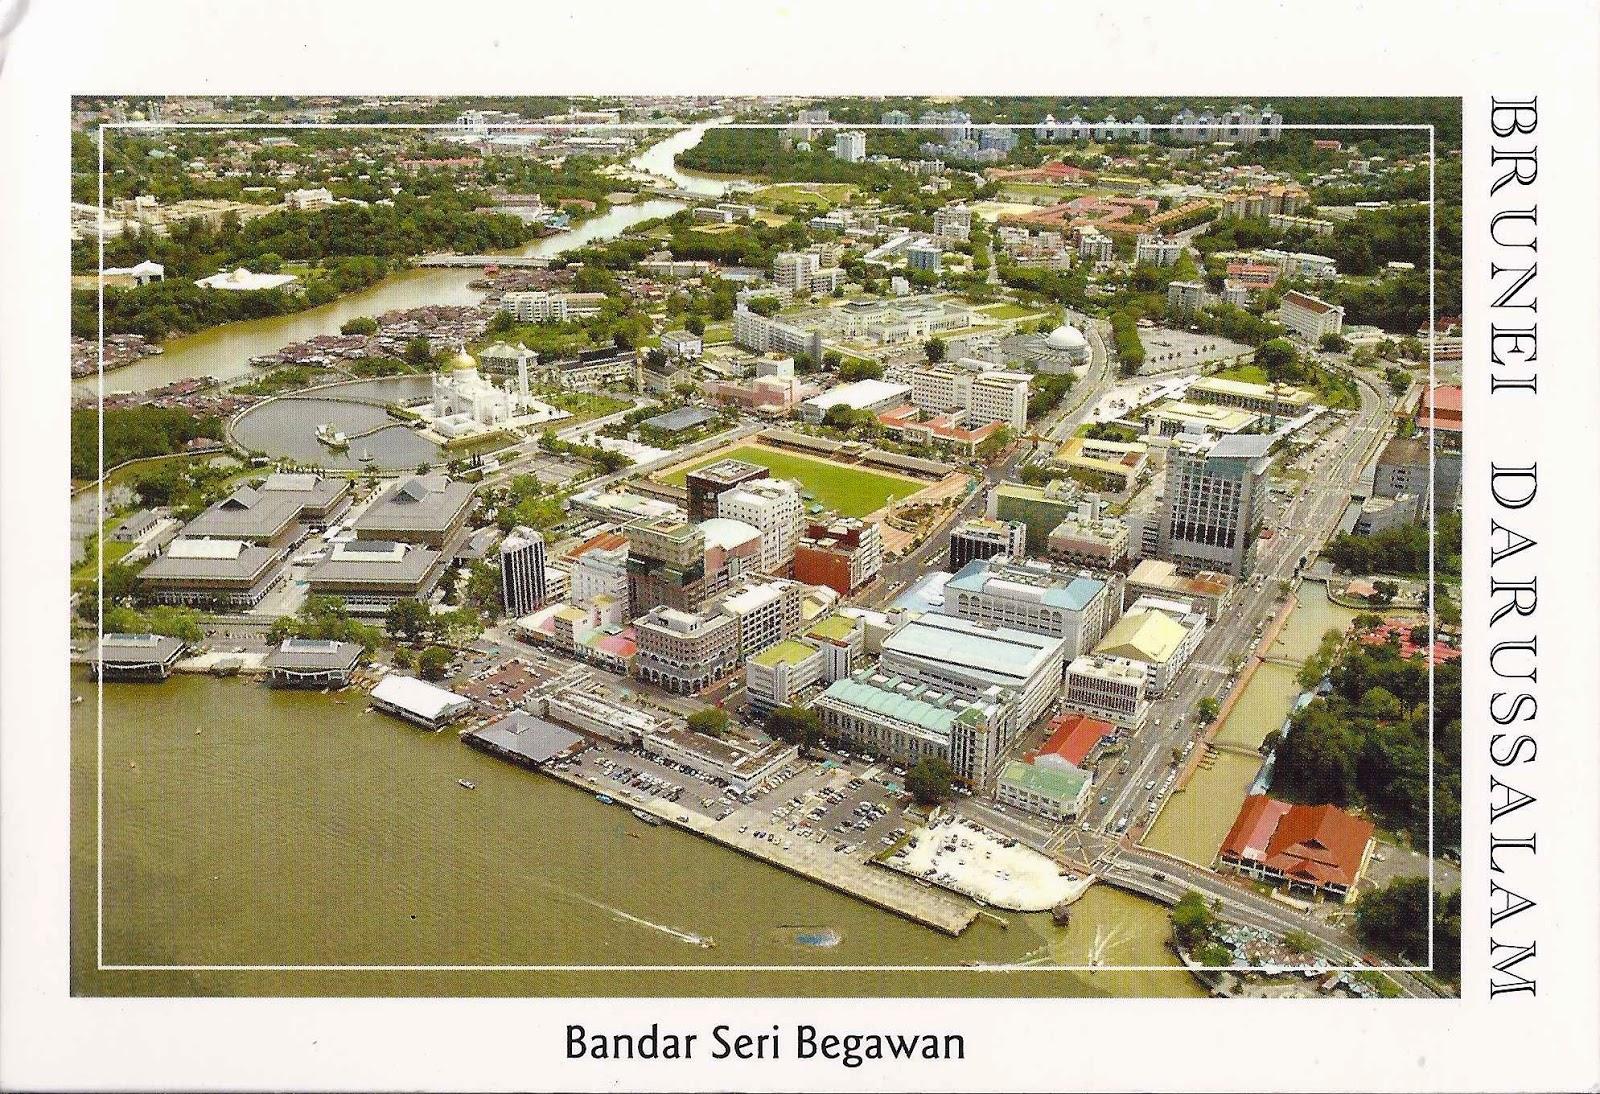 A Journey of Postcards: Bandar Seri Begawan, the capital of